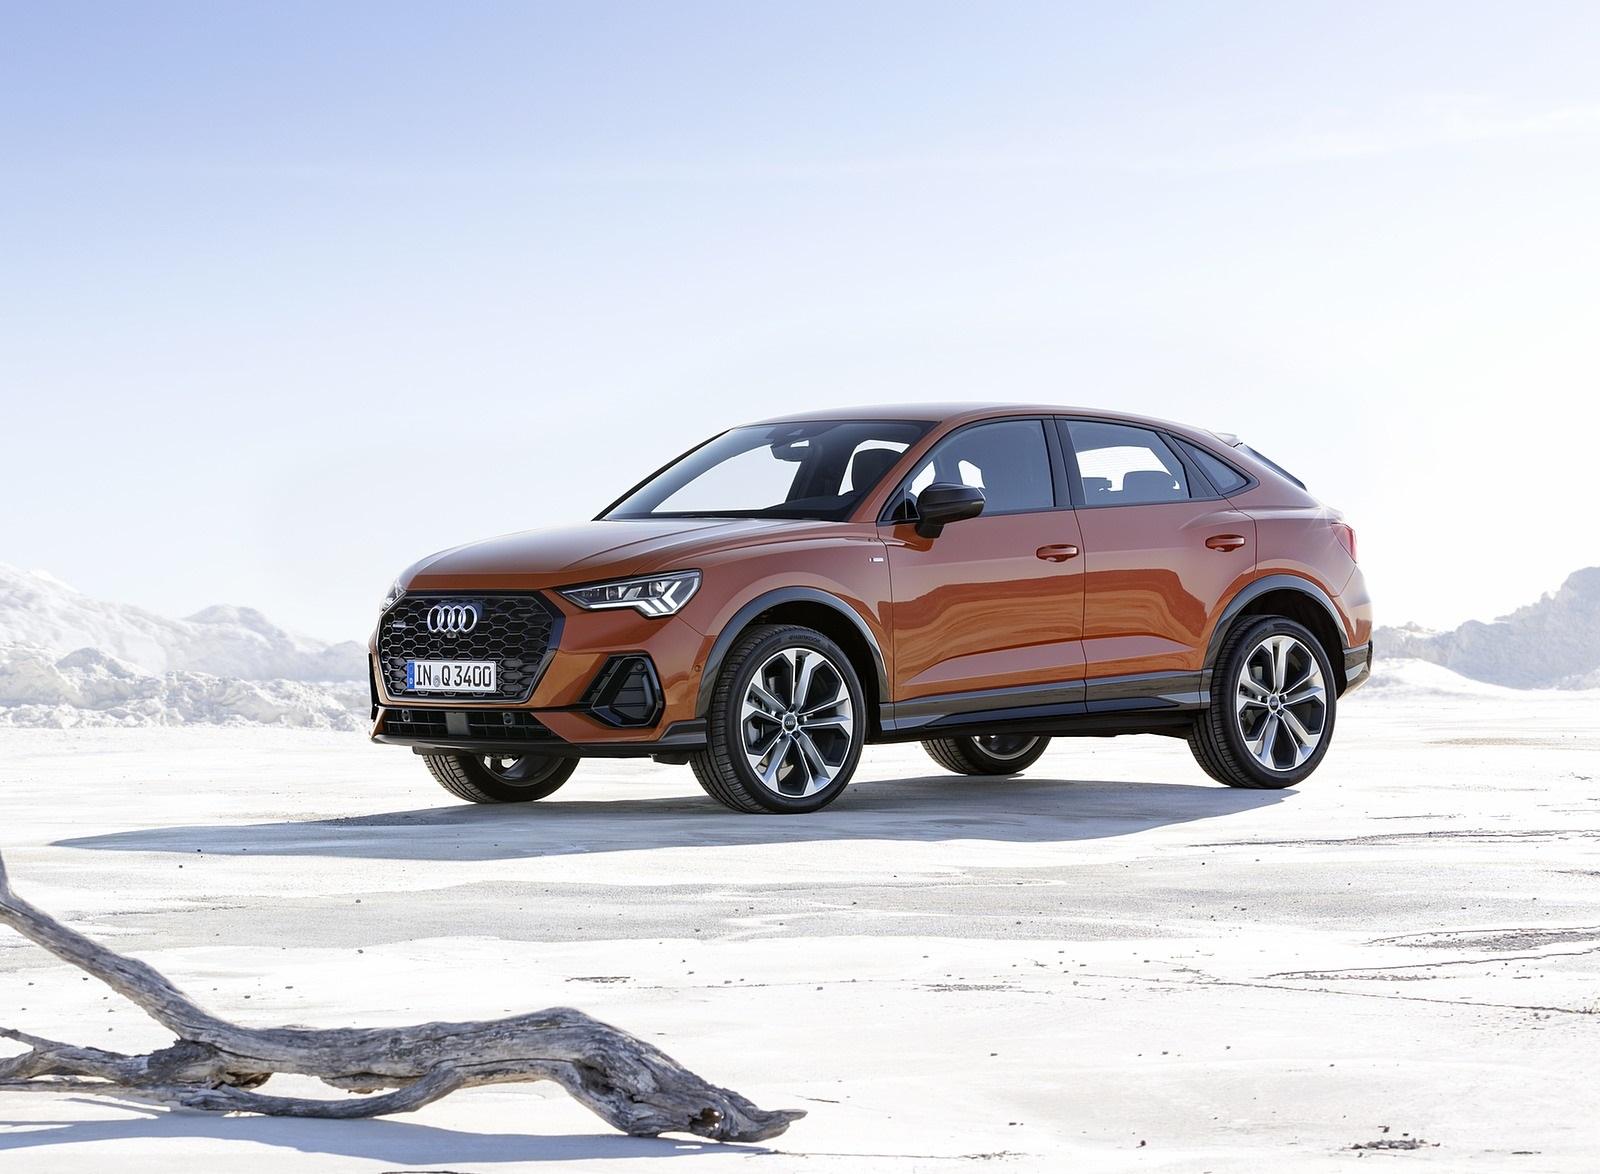 2020 Audi Q3 Sportback S line (Color: Pulse Orange) Front Three-Quarter Wallpapers (7)